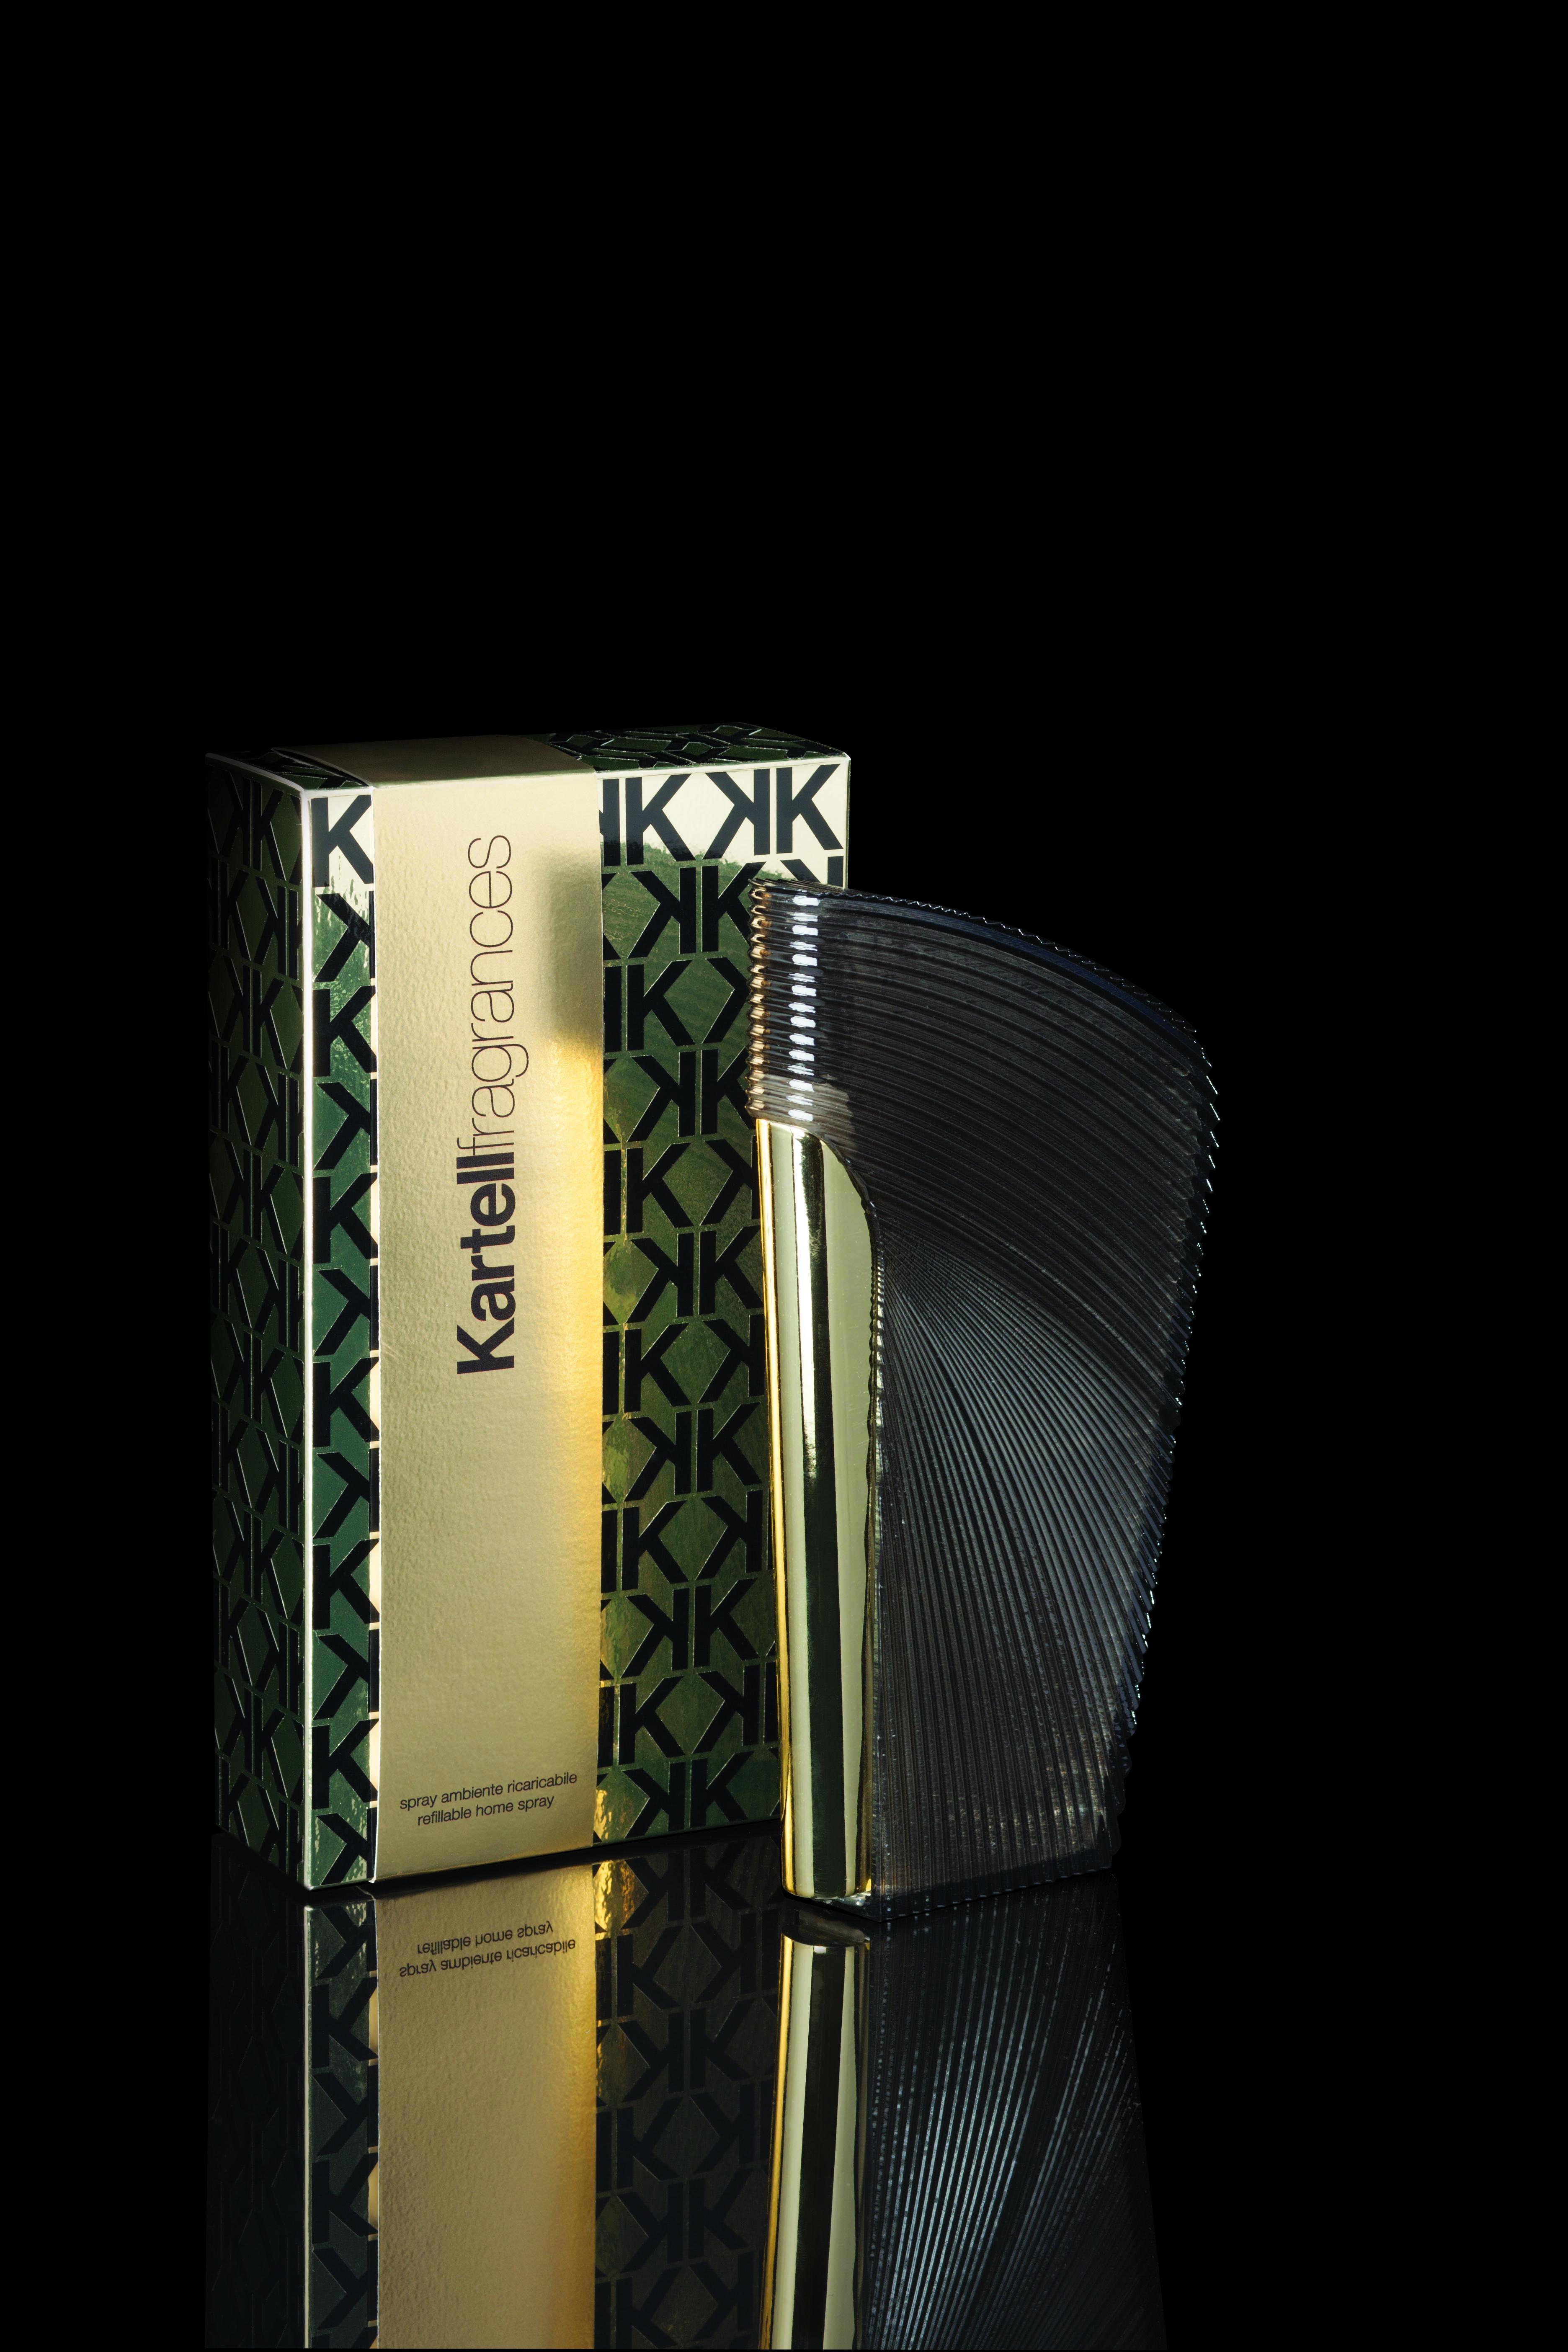 Perfume gun